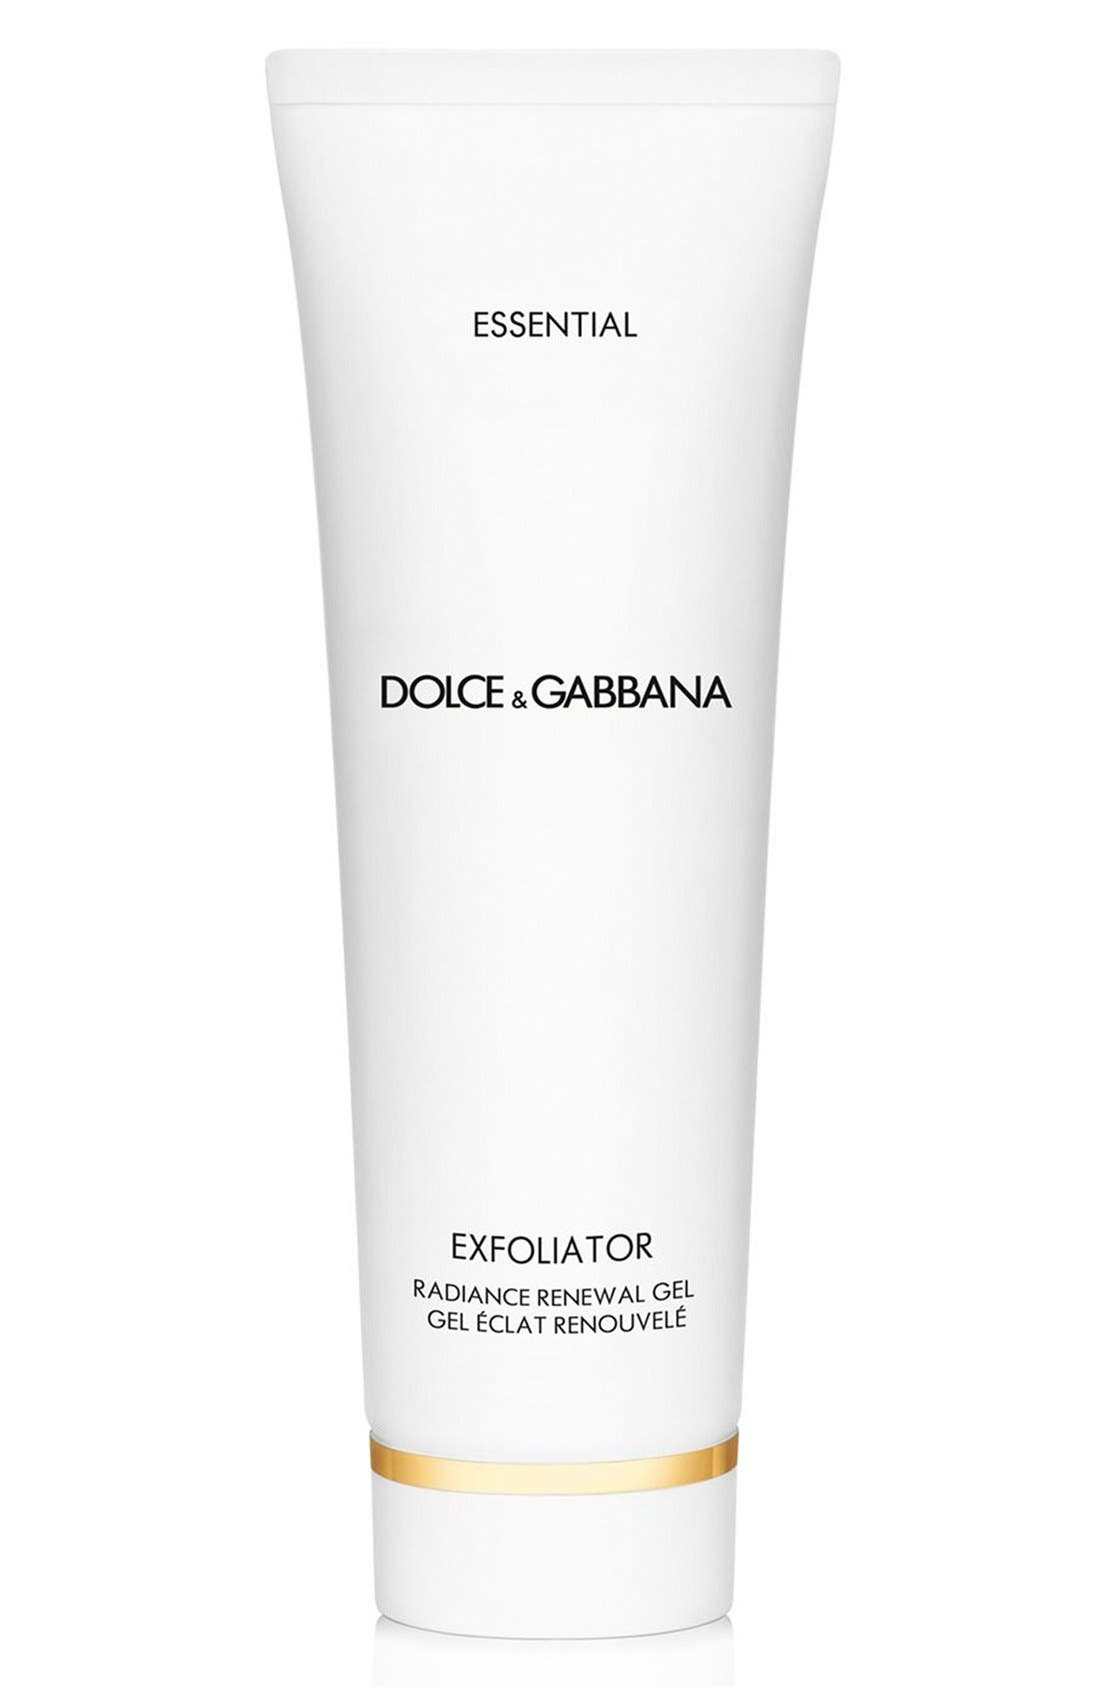 Dolce&Gabbana Beauty 'Essential' ExfoliatorRadiance Renewal Gel